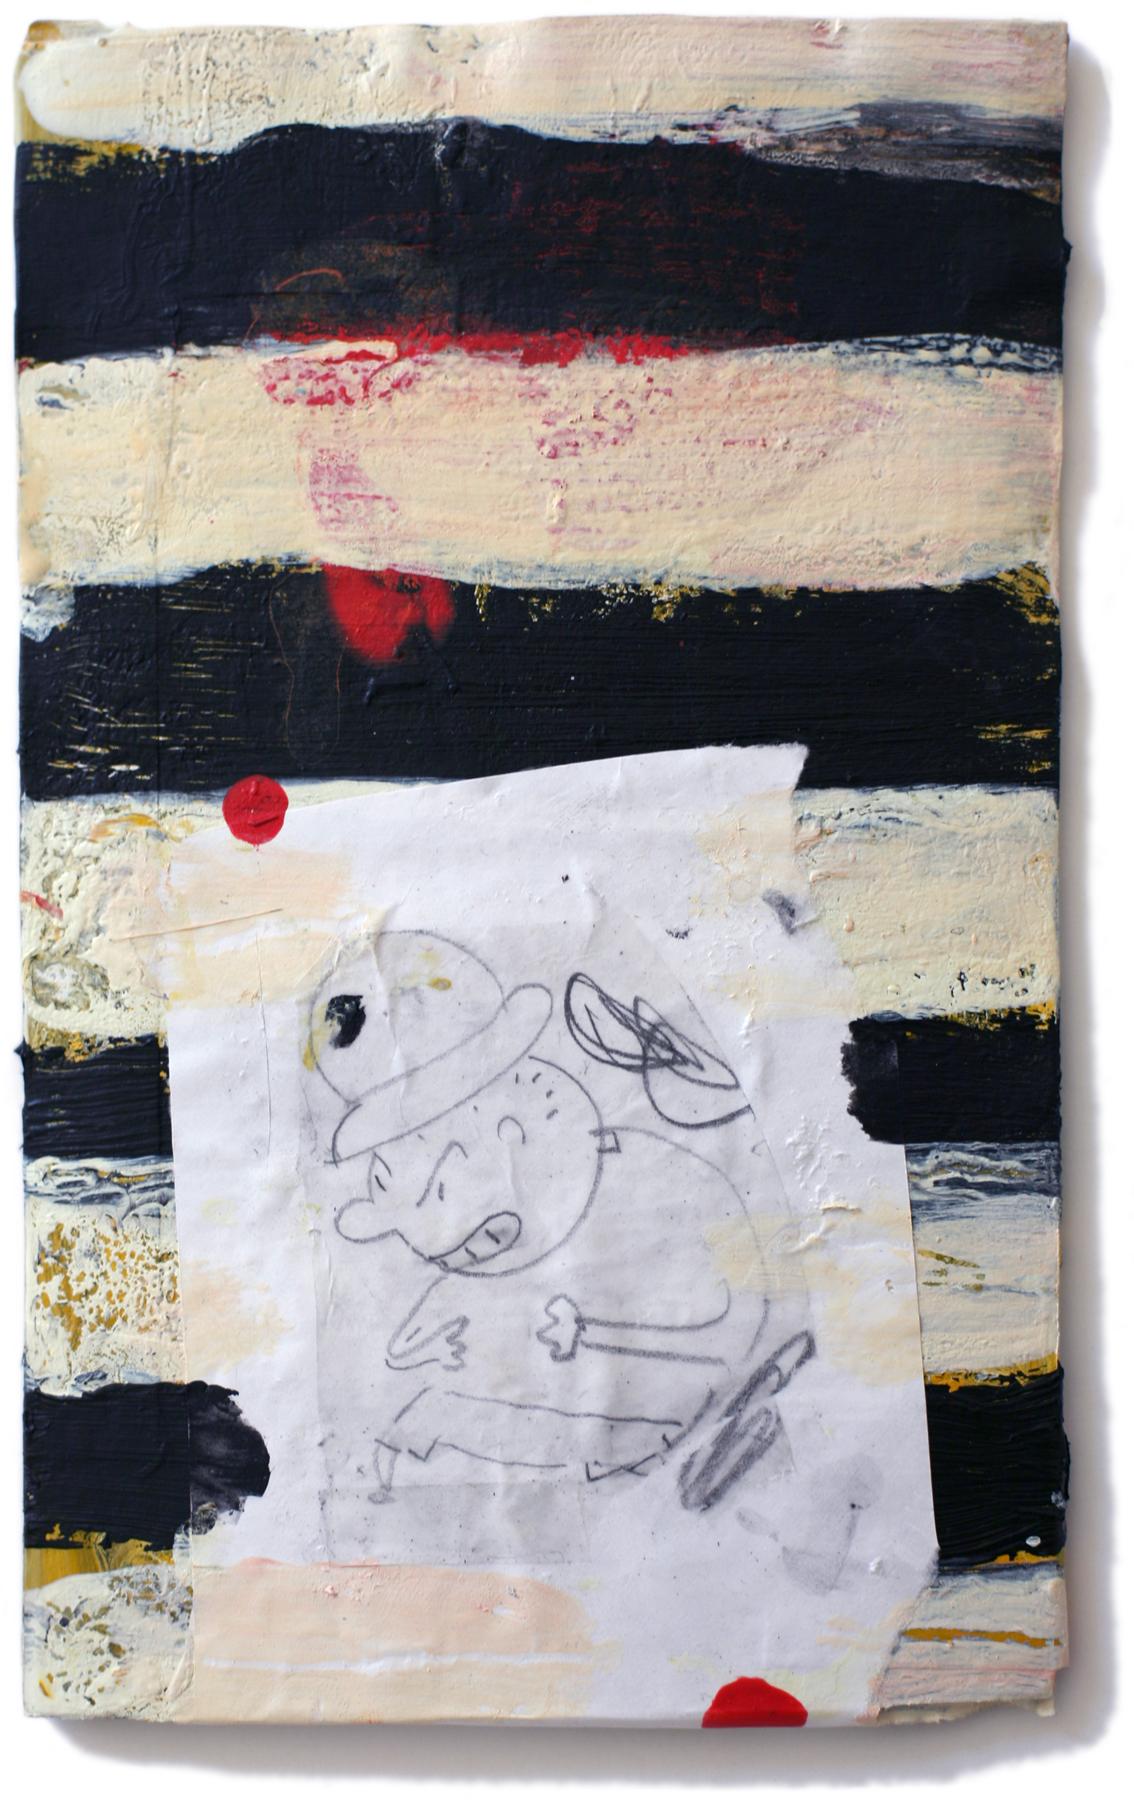 "Ill-Humored, 10"" x 6"", 2011"